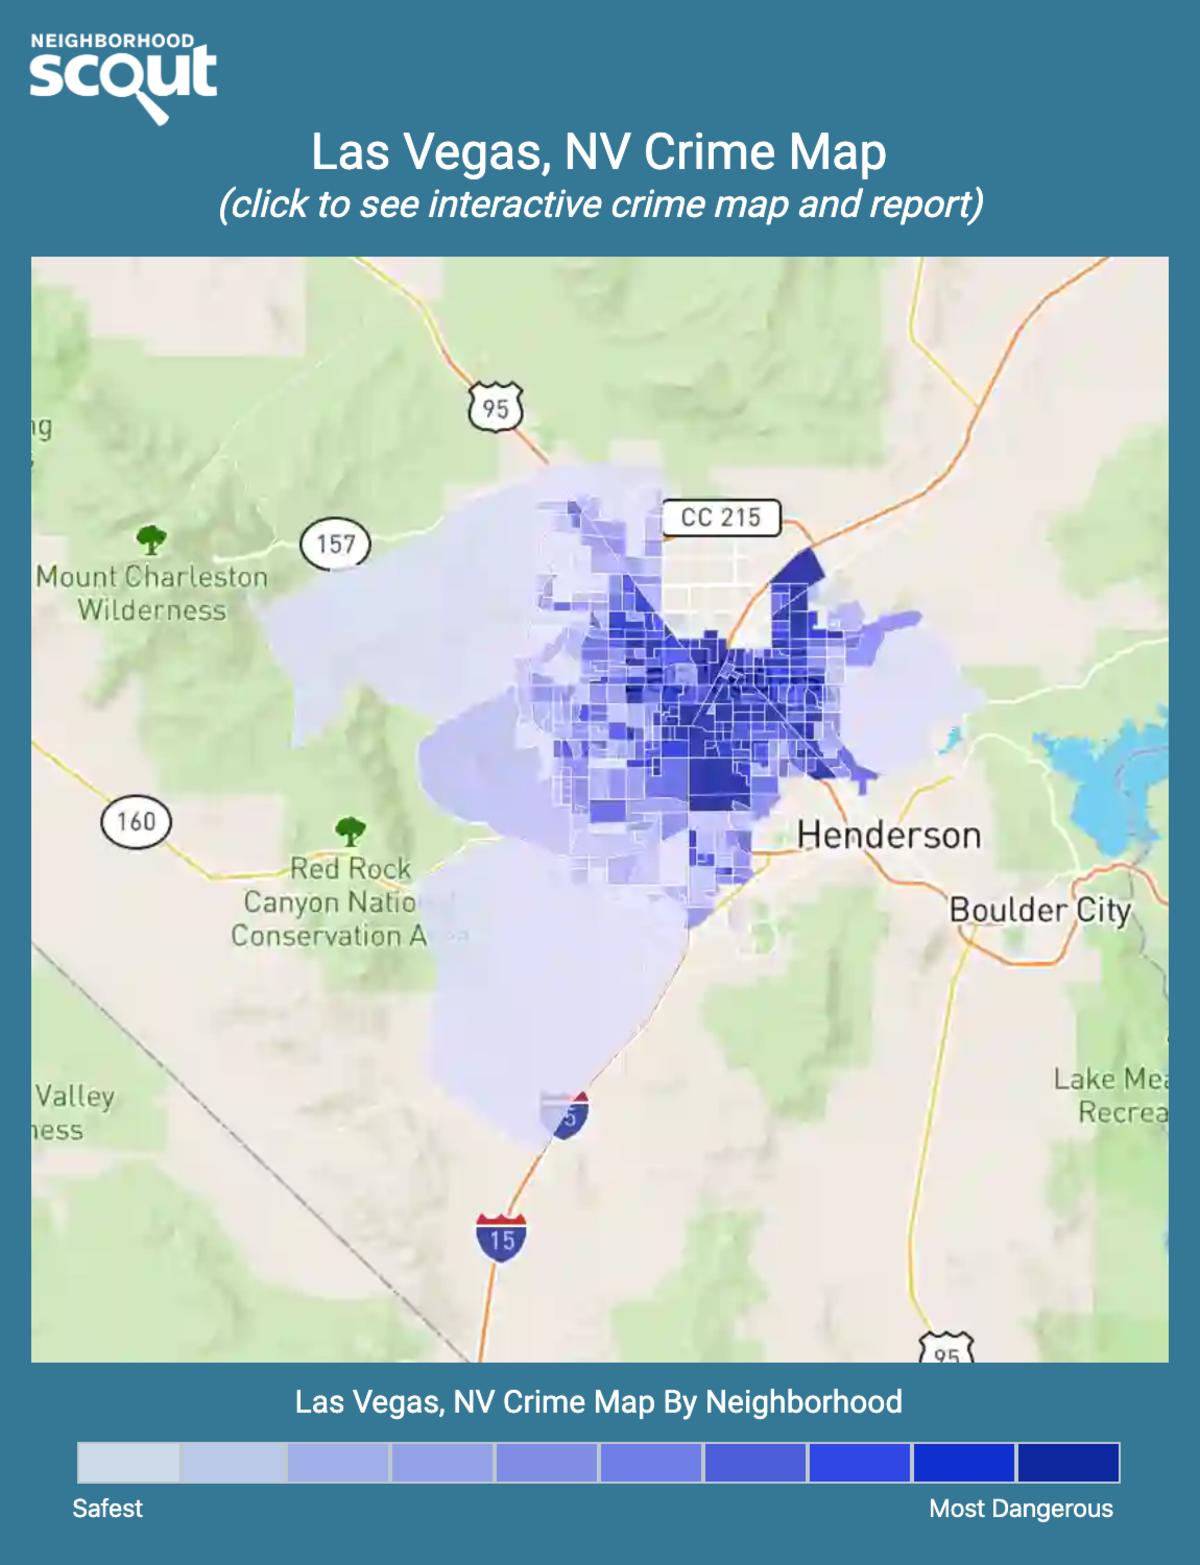 Las Vegas, Nevada crime map